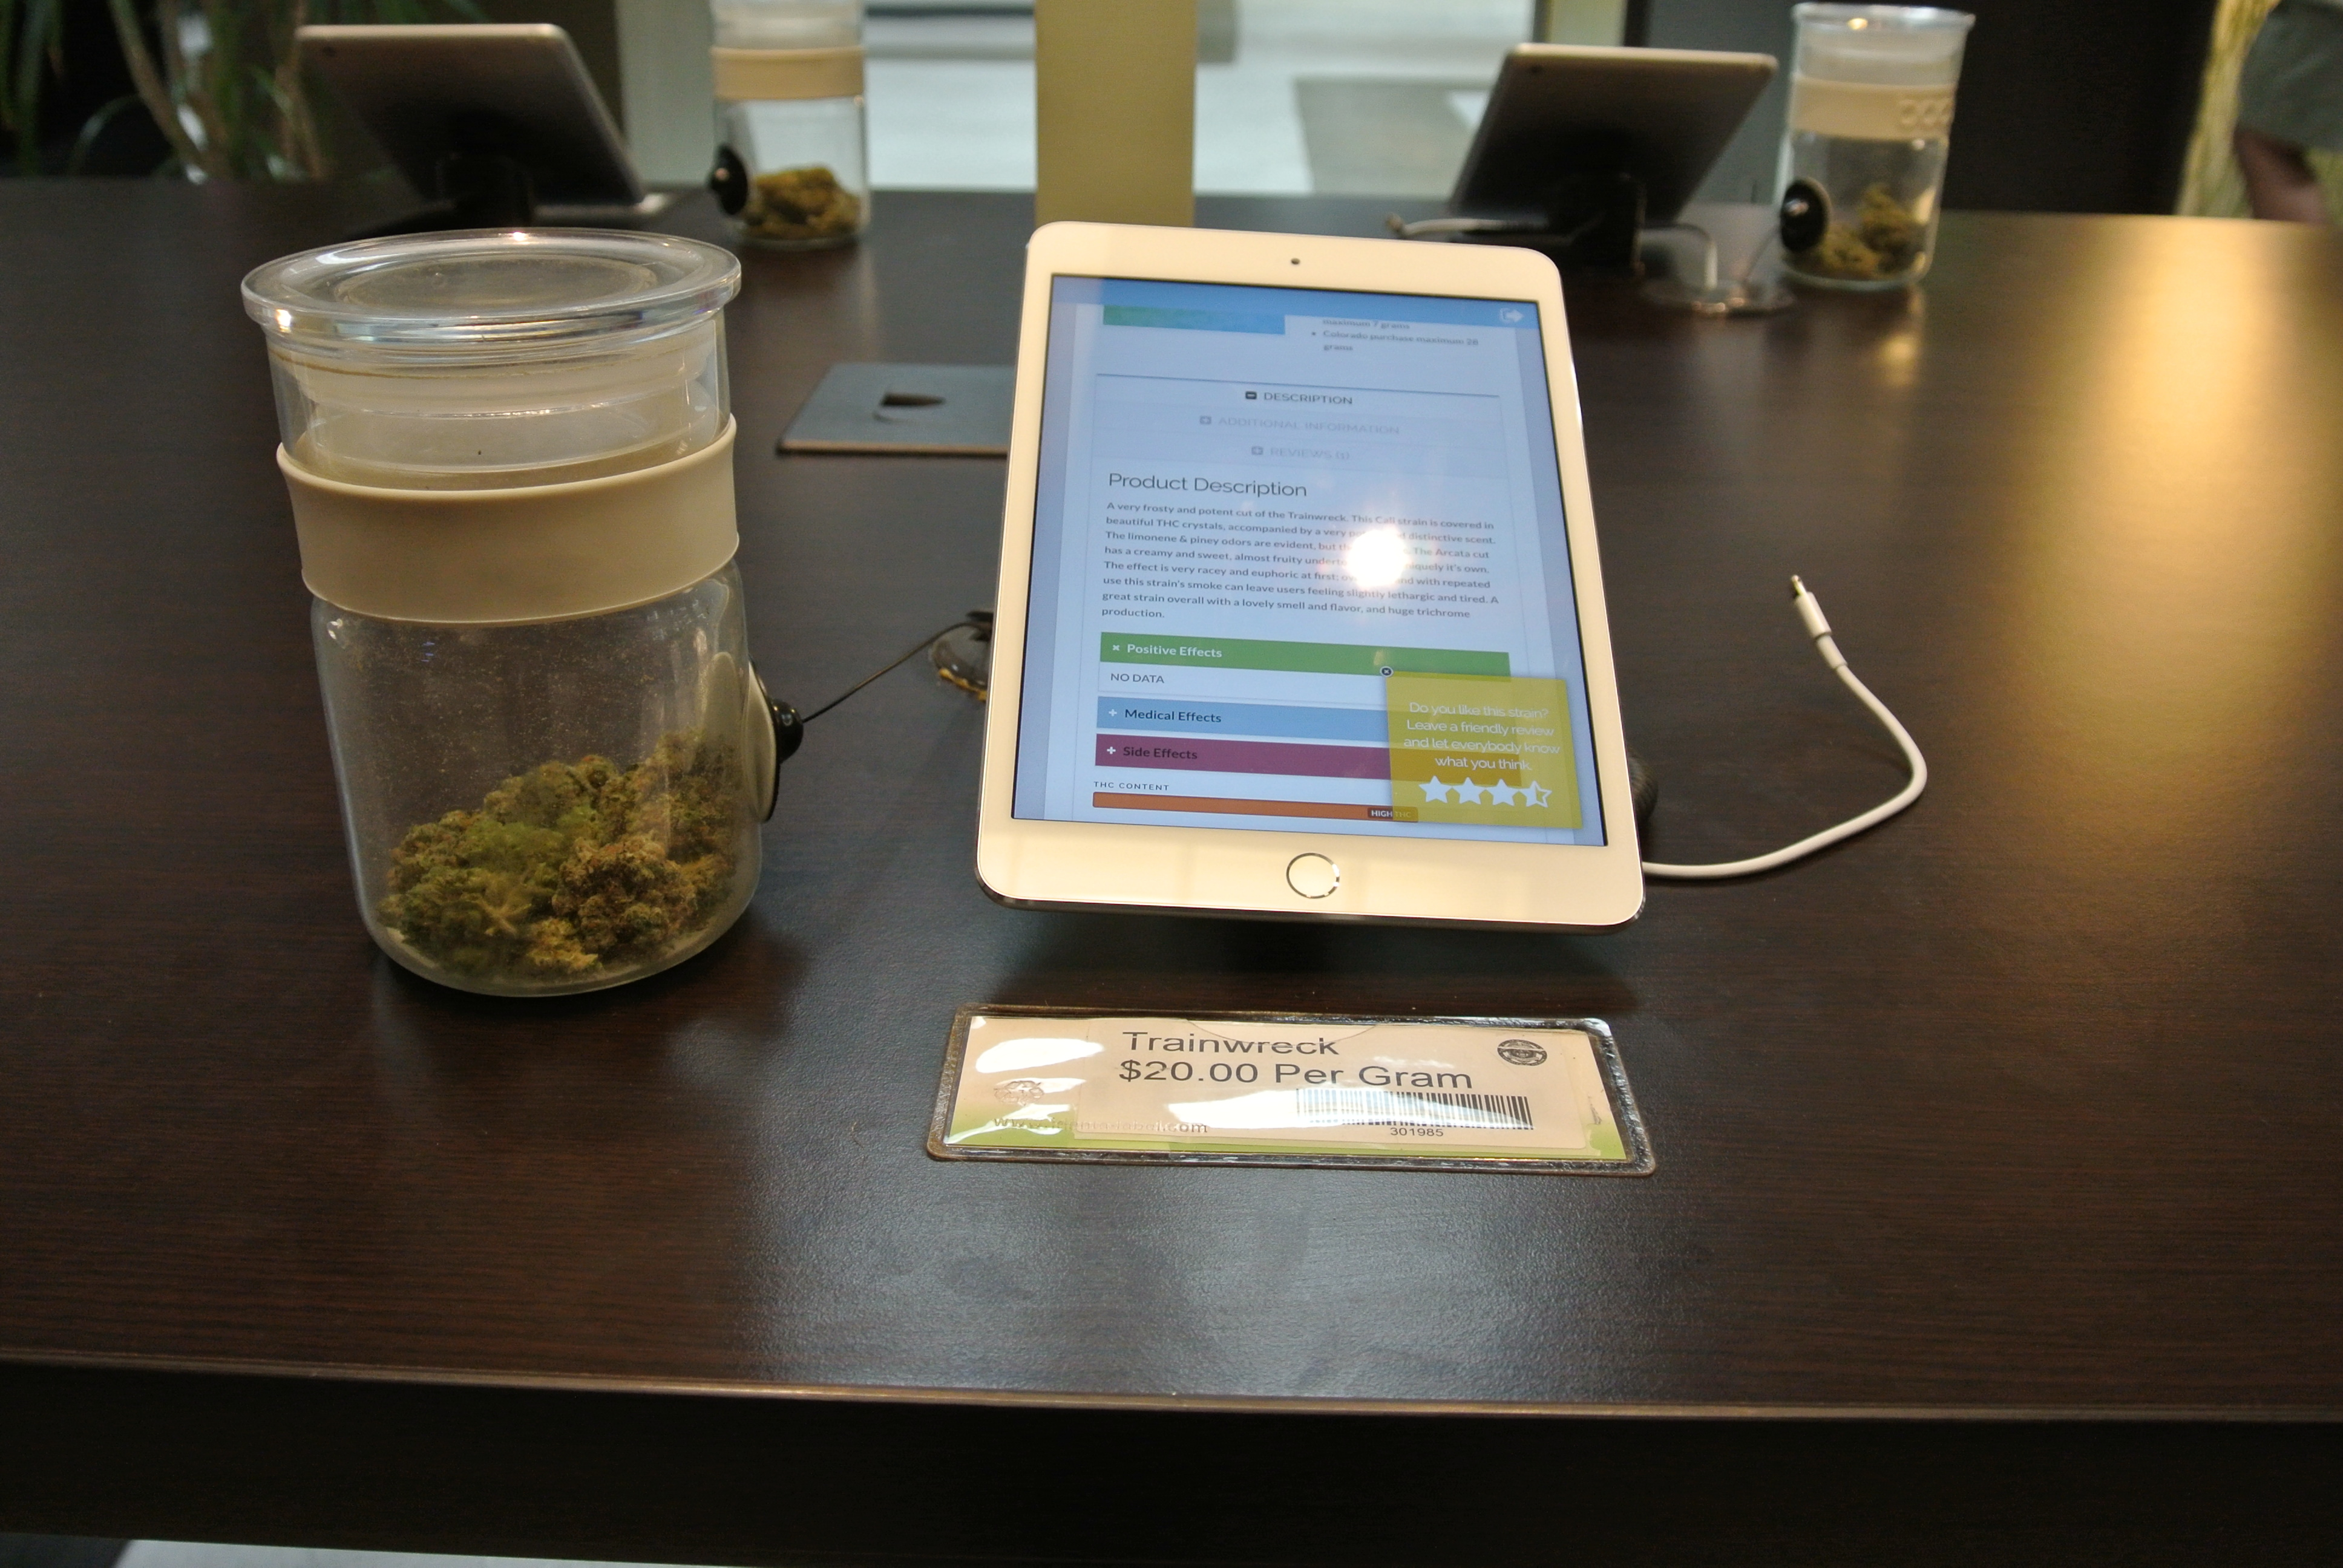 One of the marijuana strains for sale at Euflora, a recreational marijuana store.